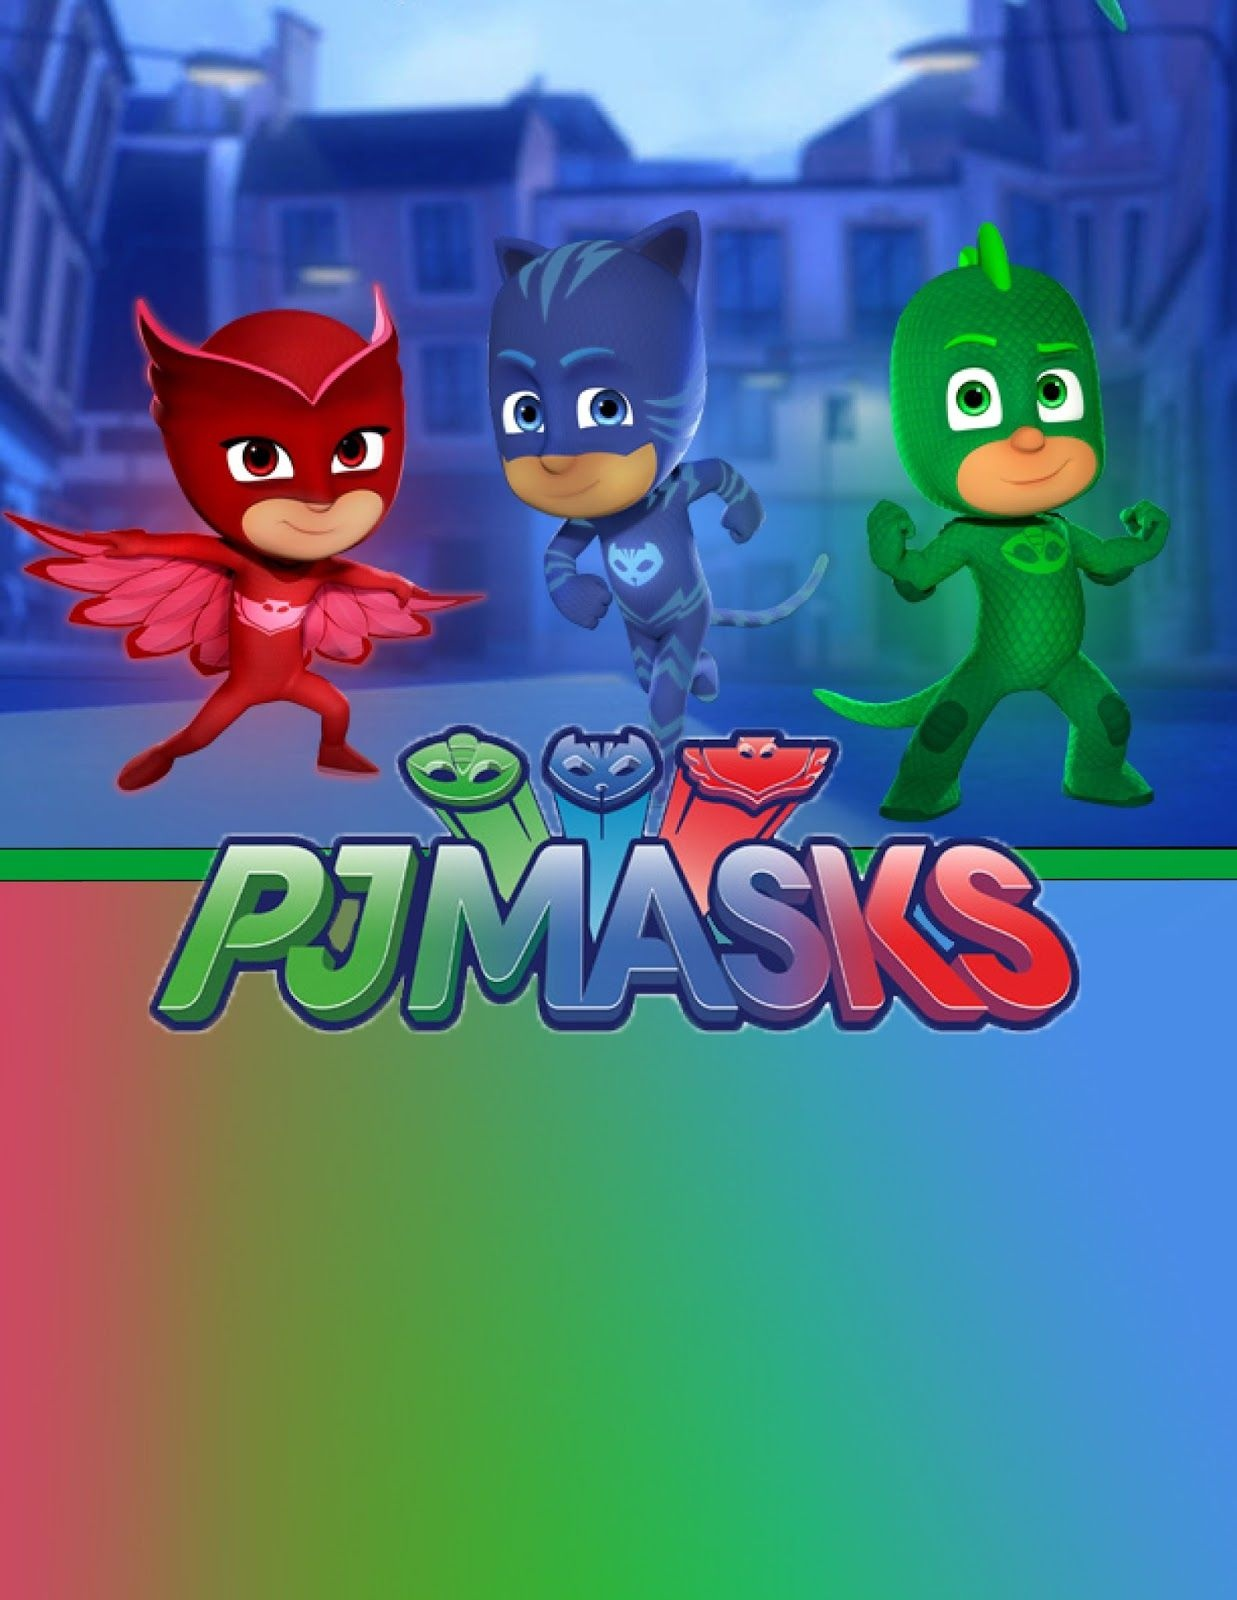 Free Pj Masks Birthday Party Printable Files Invitations | Kids - Free Printable Pj Masks Invitations